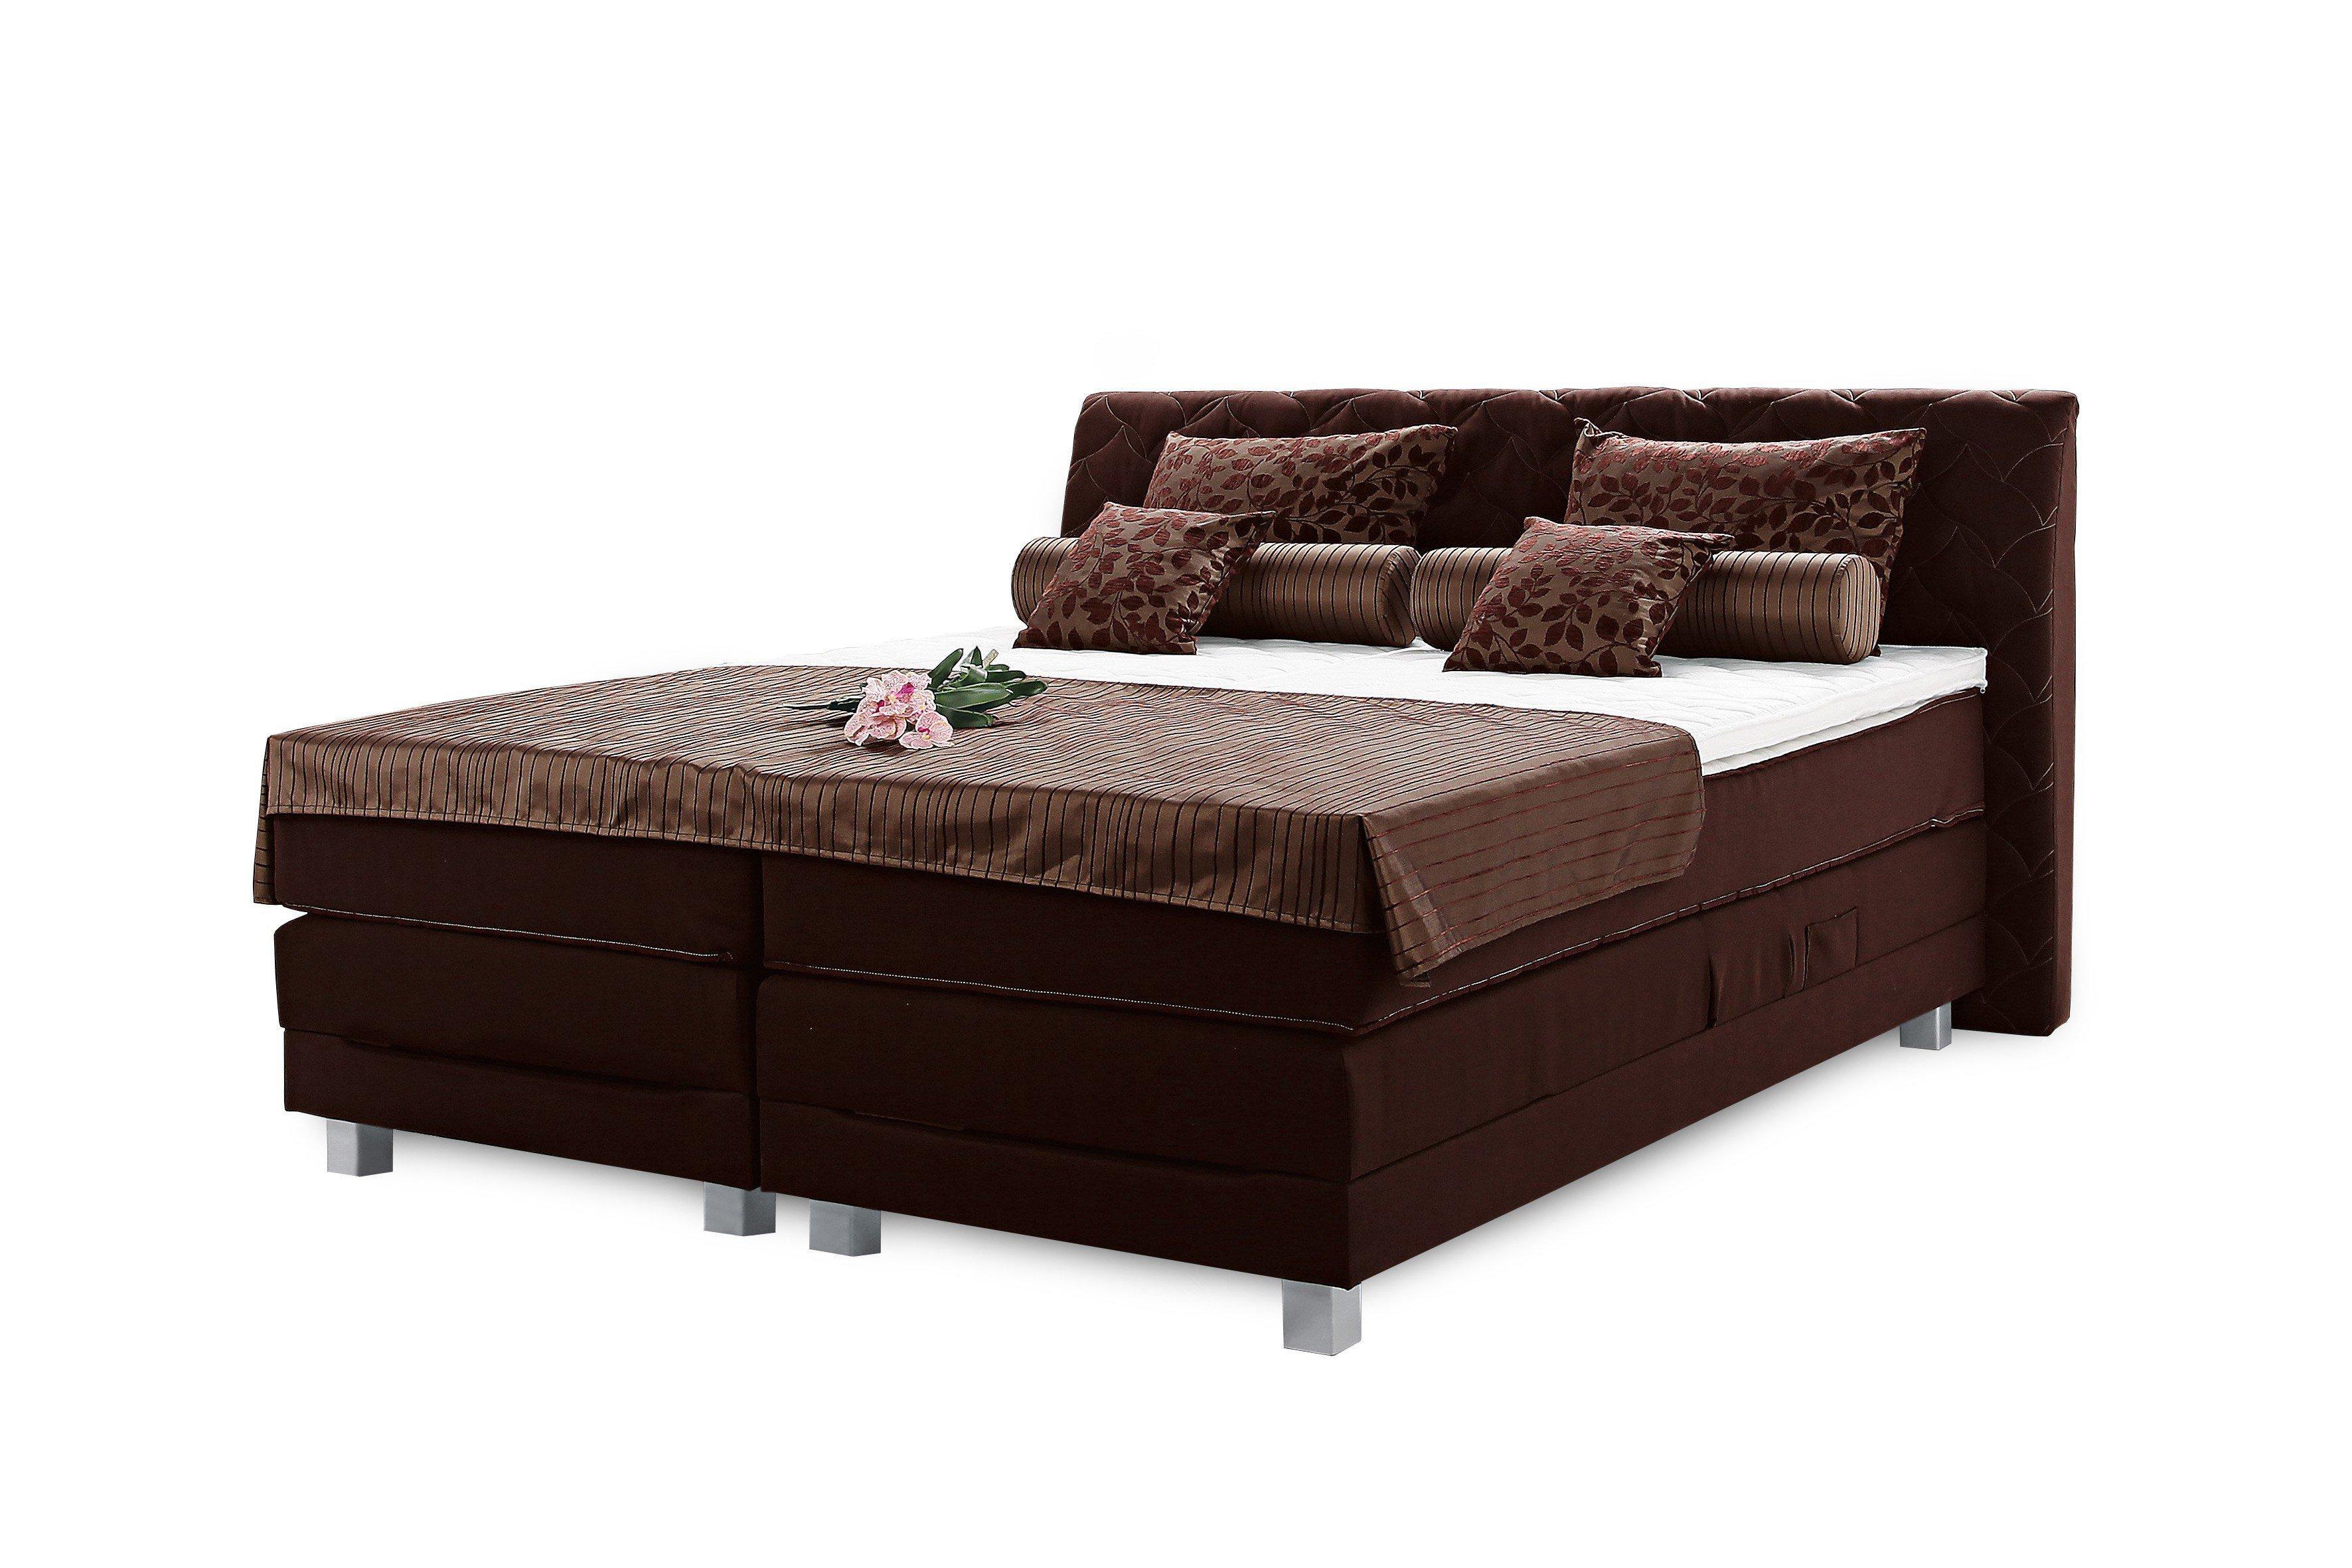 breckle boxspringbett rio merida in braun m bel letz. Black Bedroom Furniture Sets. Home Design Ideas